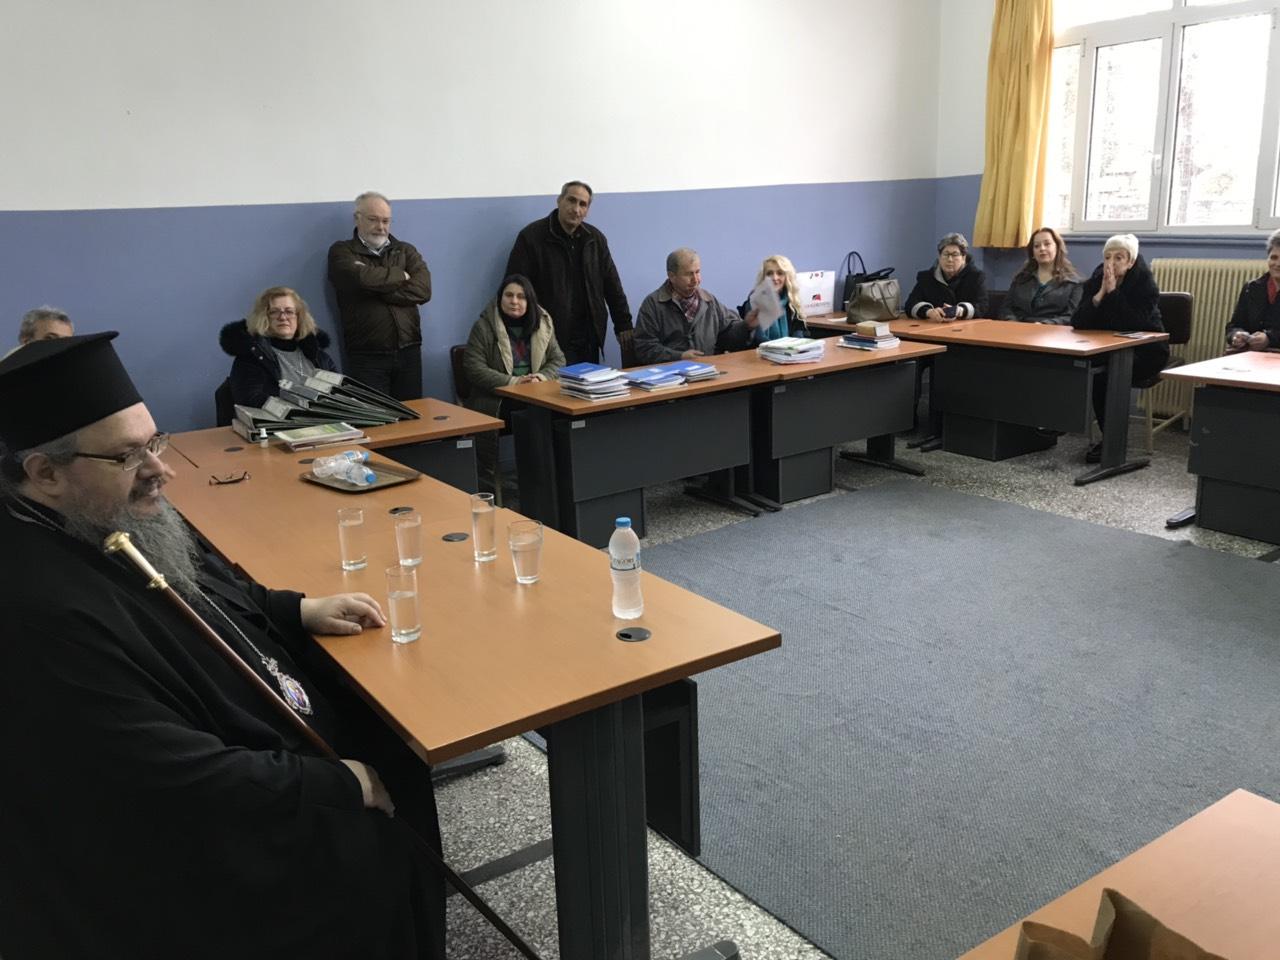 sxolia tirnavos 8 - Σε σχολεία του Τυρνάβου ο Σεβασμιώτατος (φωτ.)